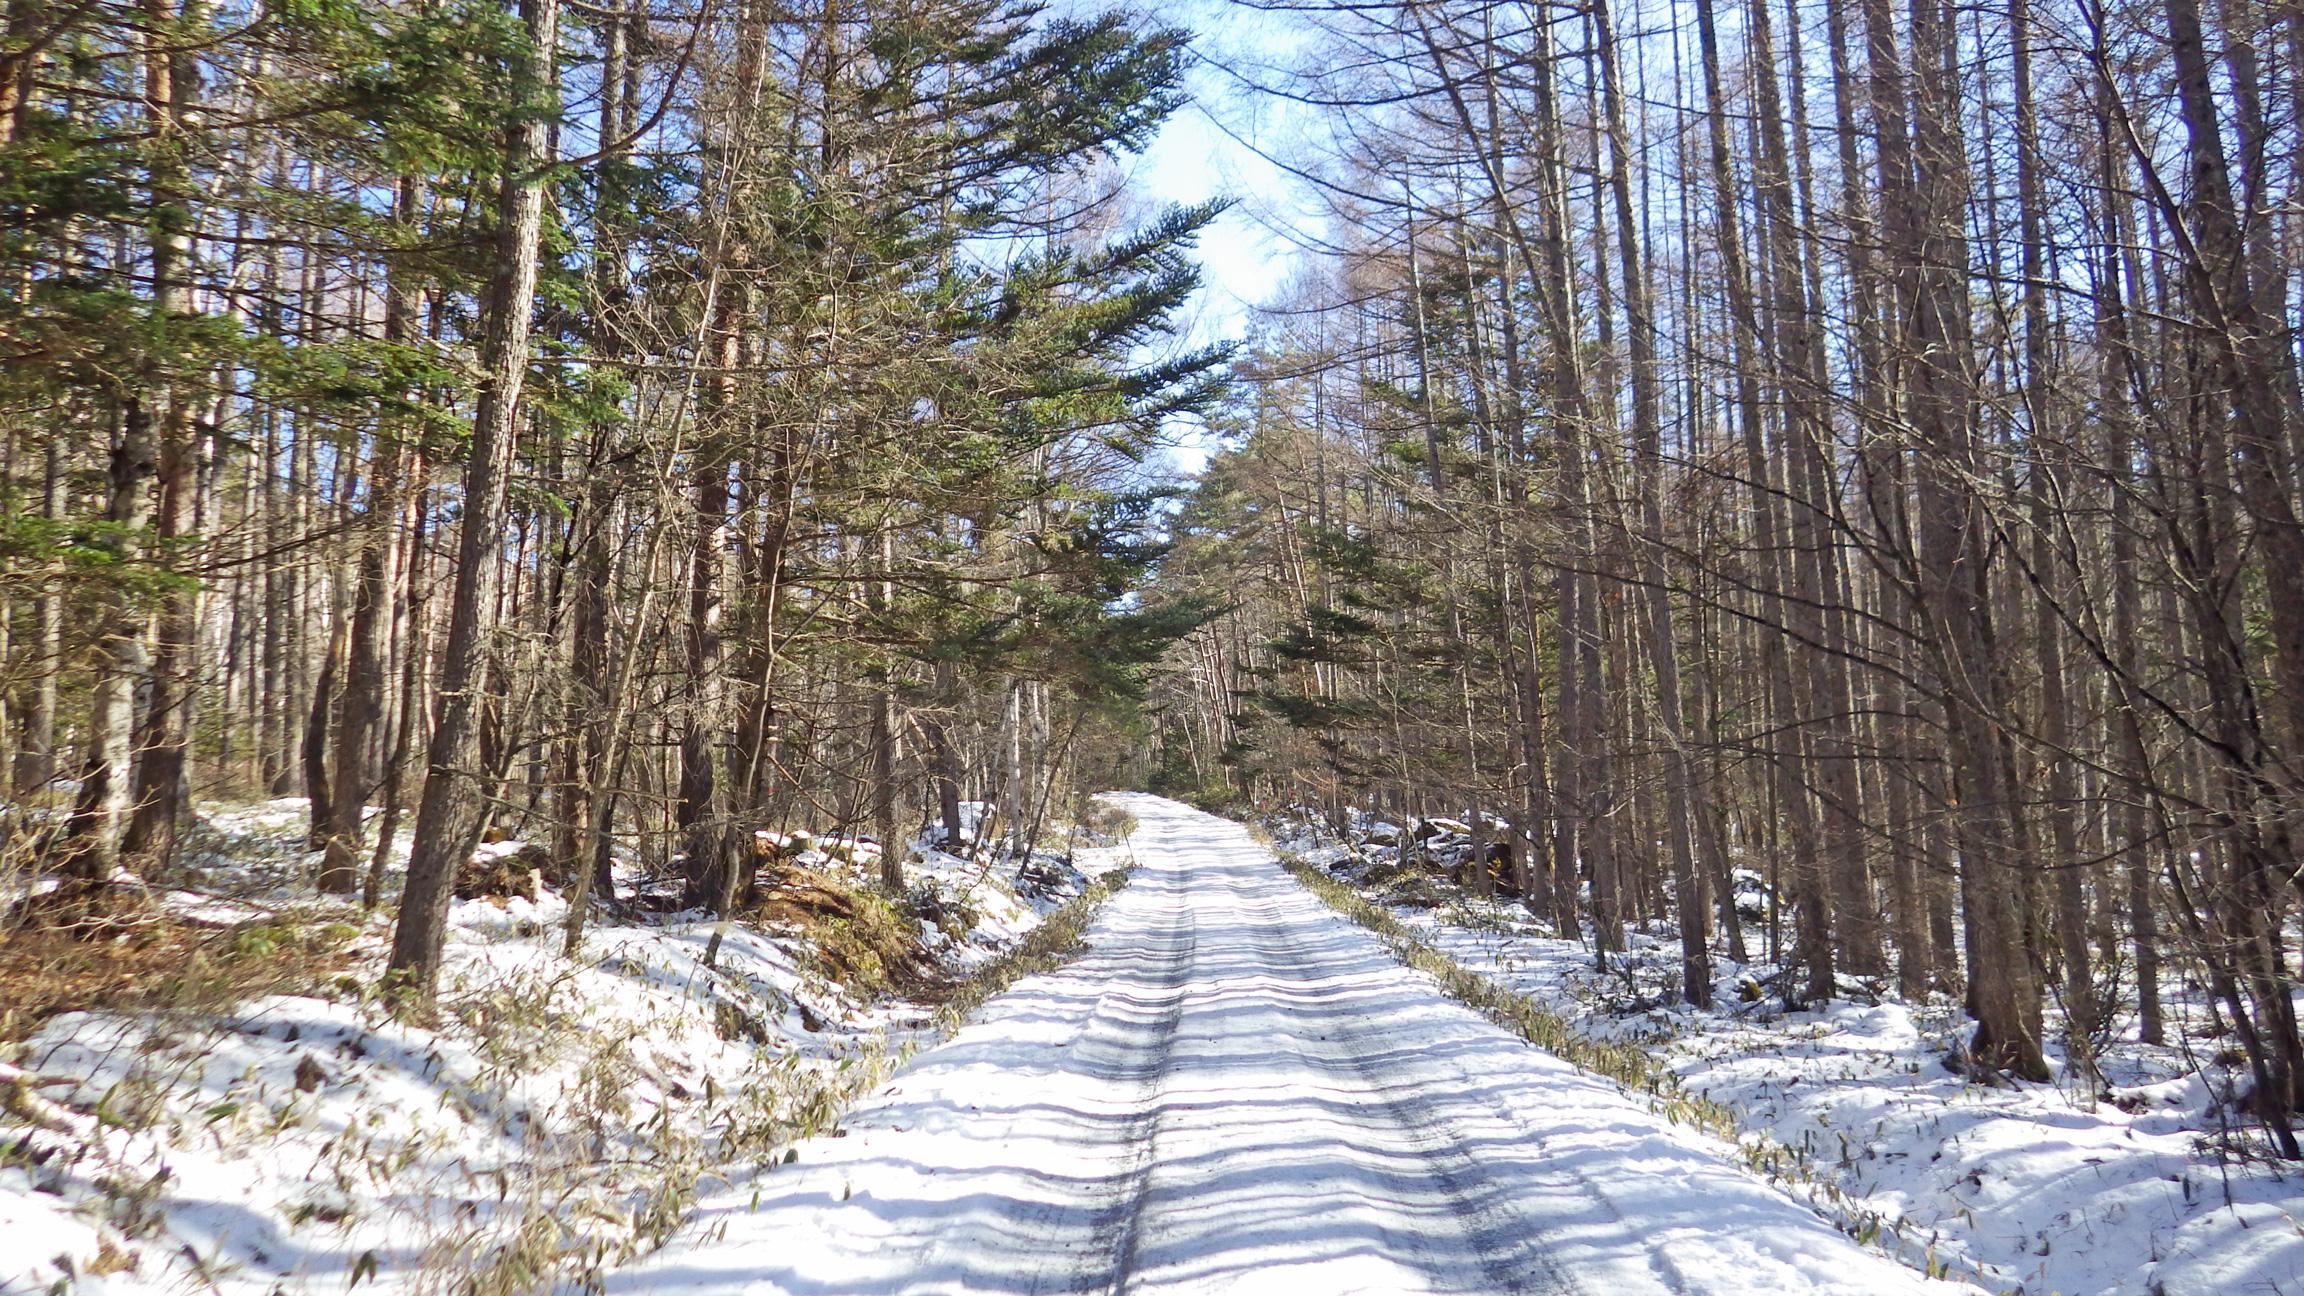 美濃戸口~美濃戸の林道